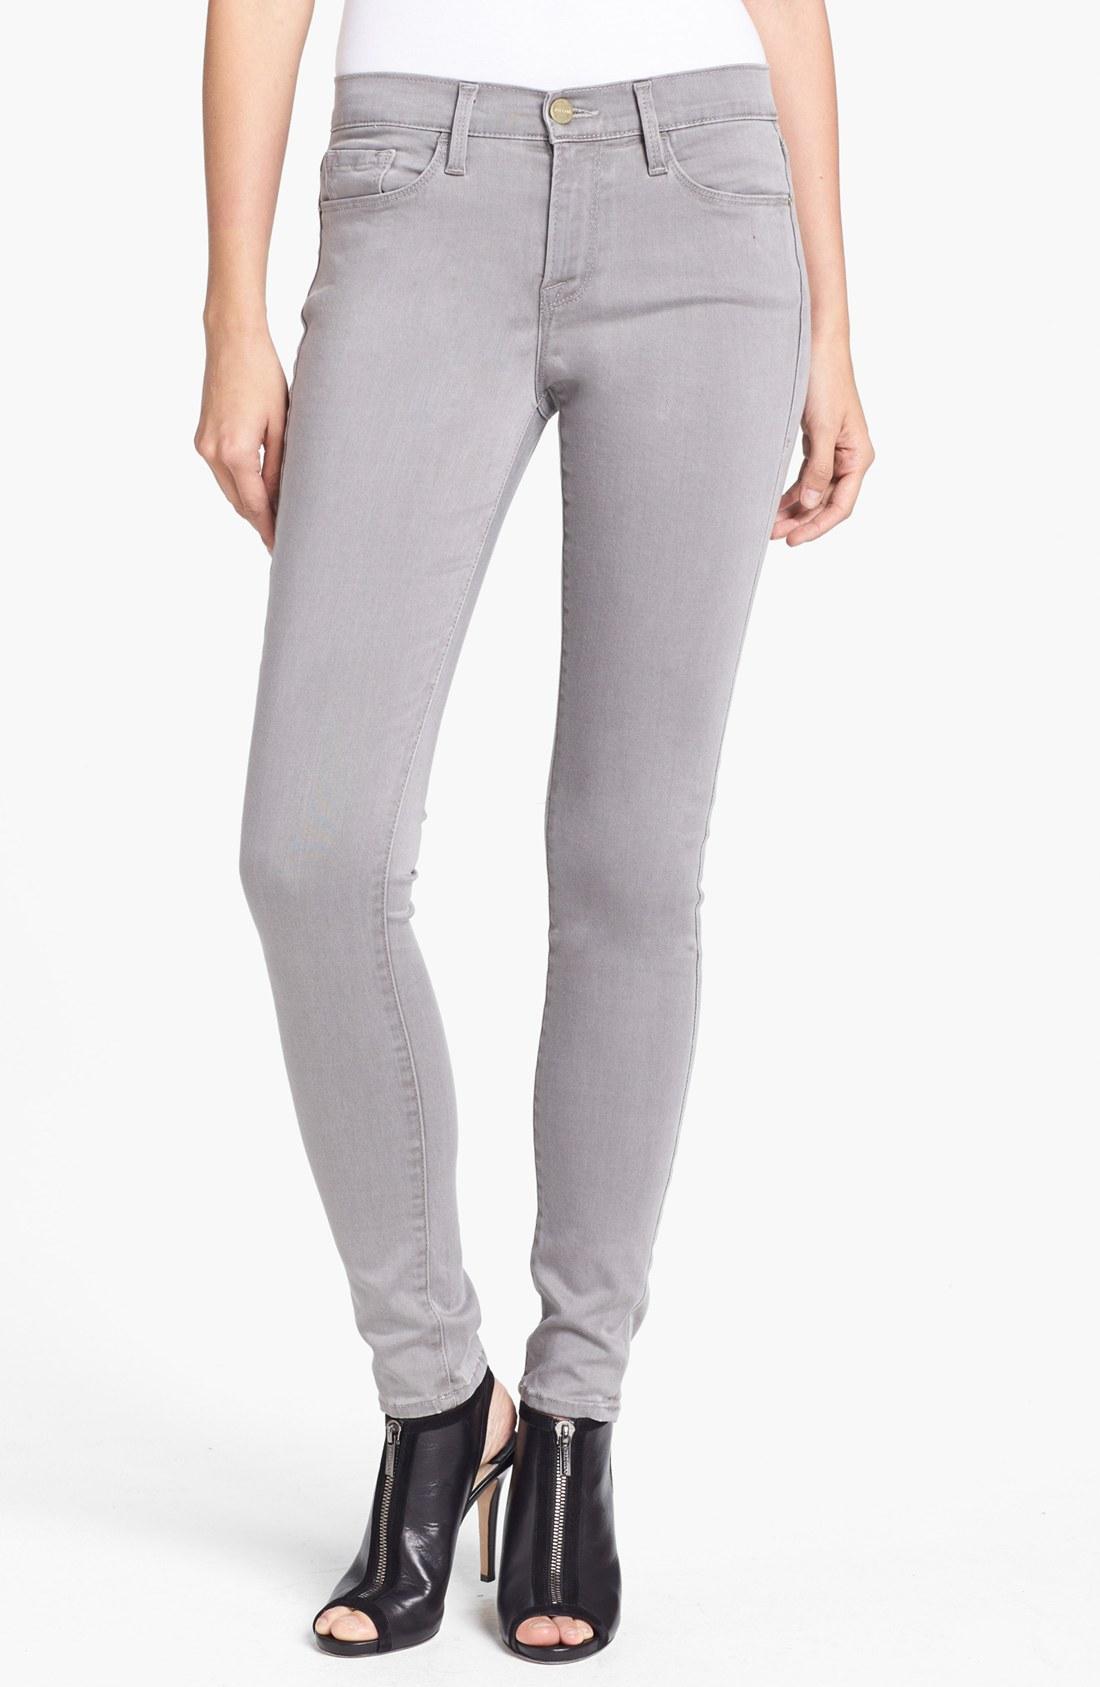 Frame Denim Le Luxe Noir Skinny Jeans In Gray Trocadero